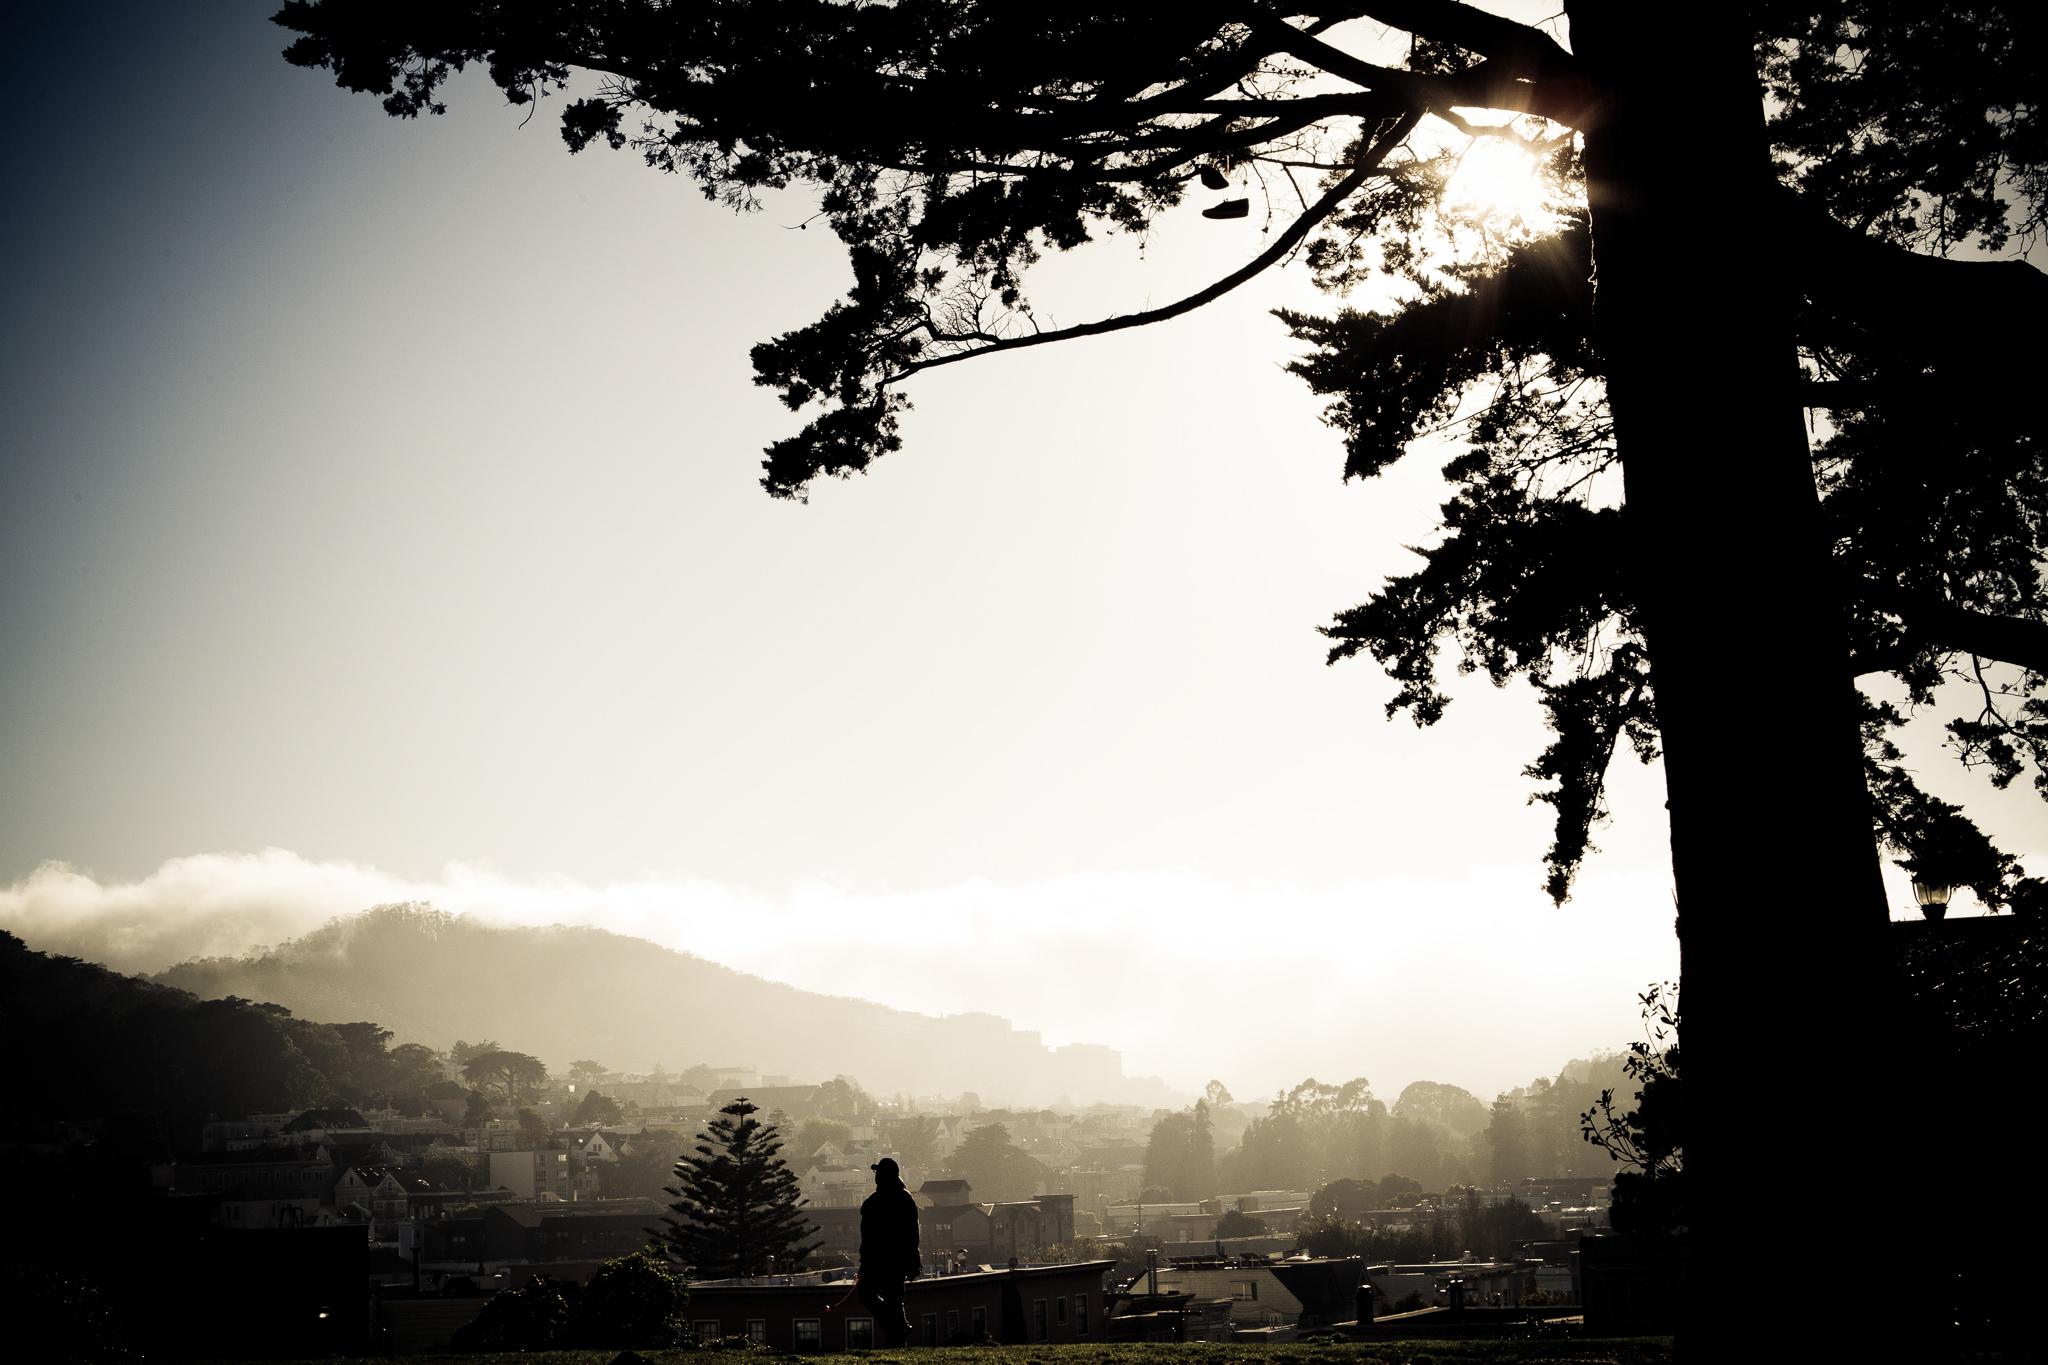 014_stroll_in_the_park_SF.jpg